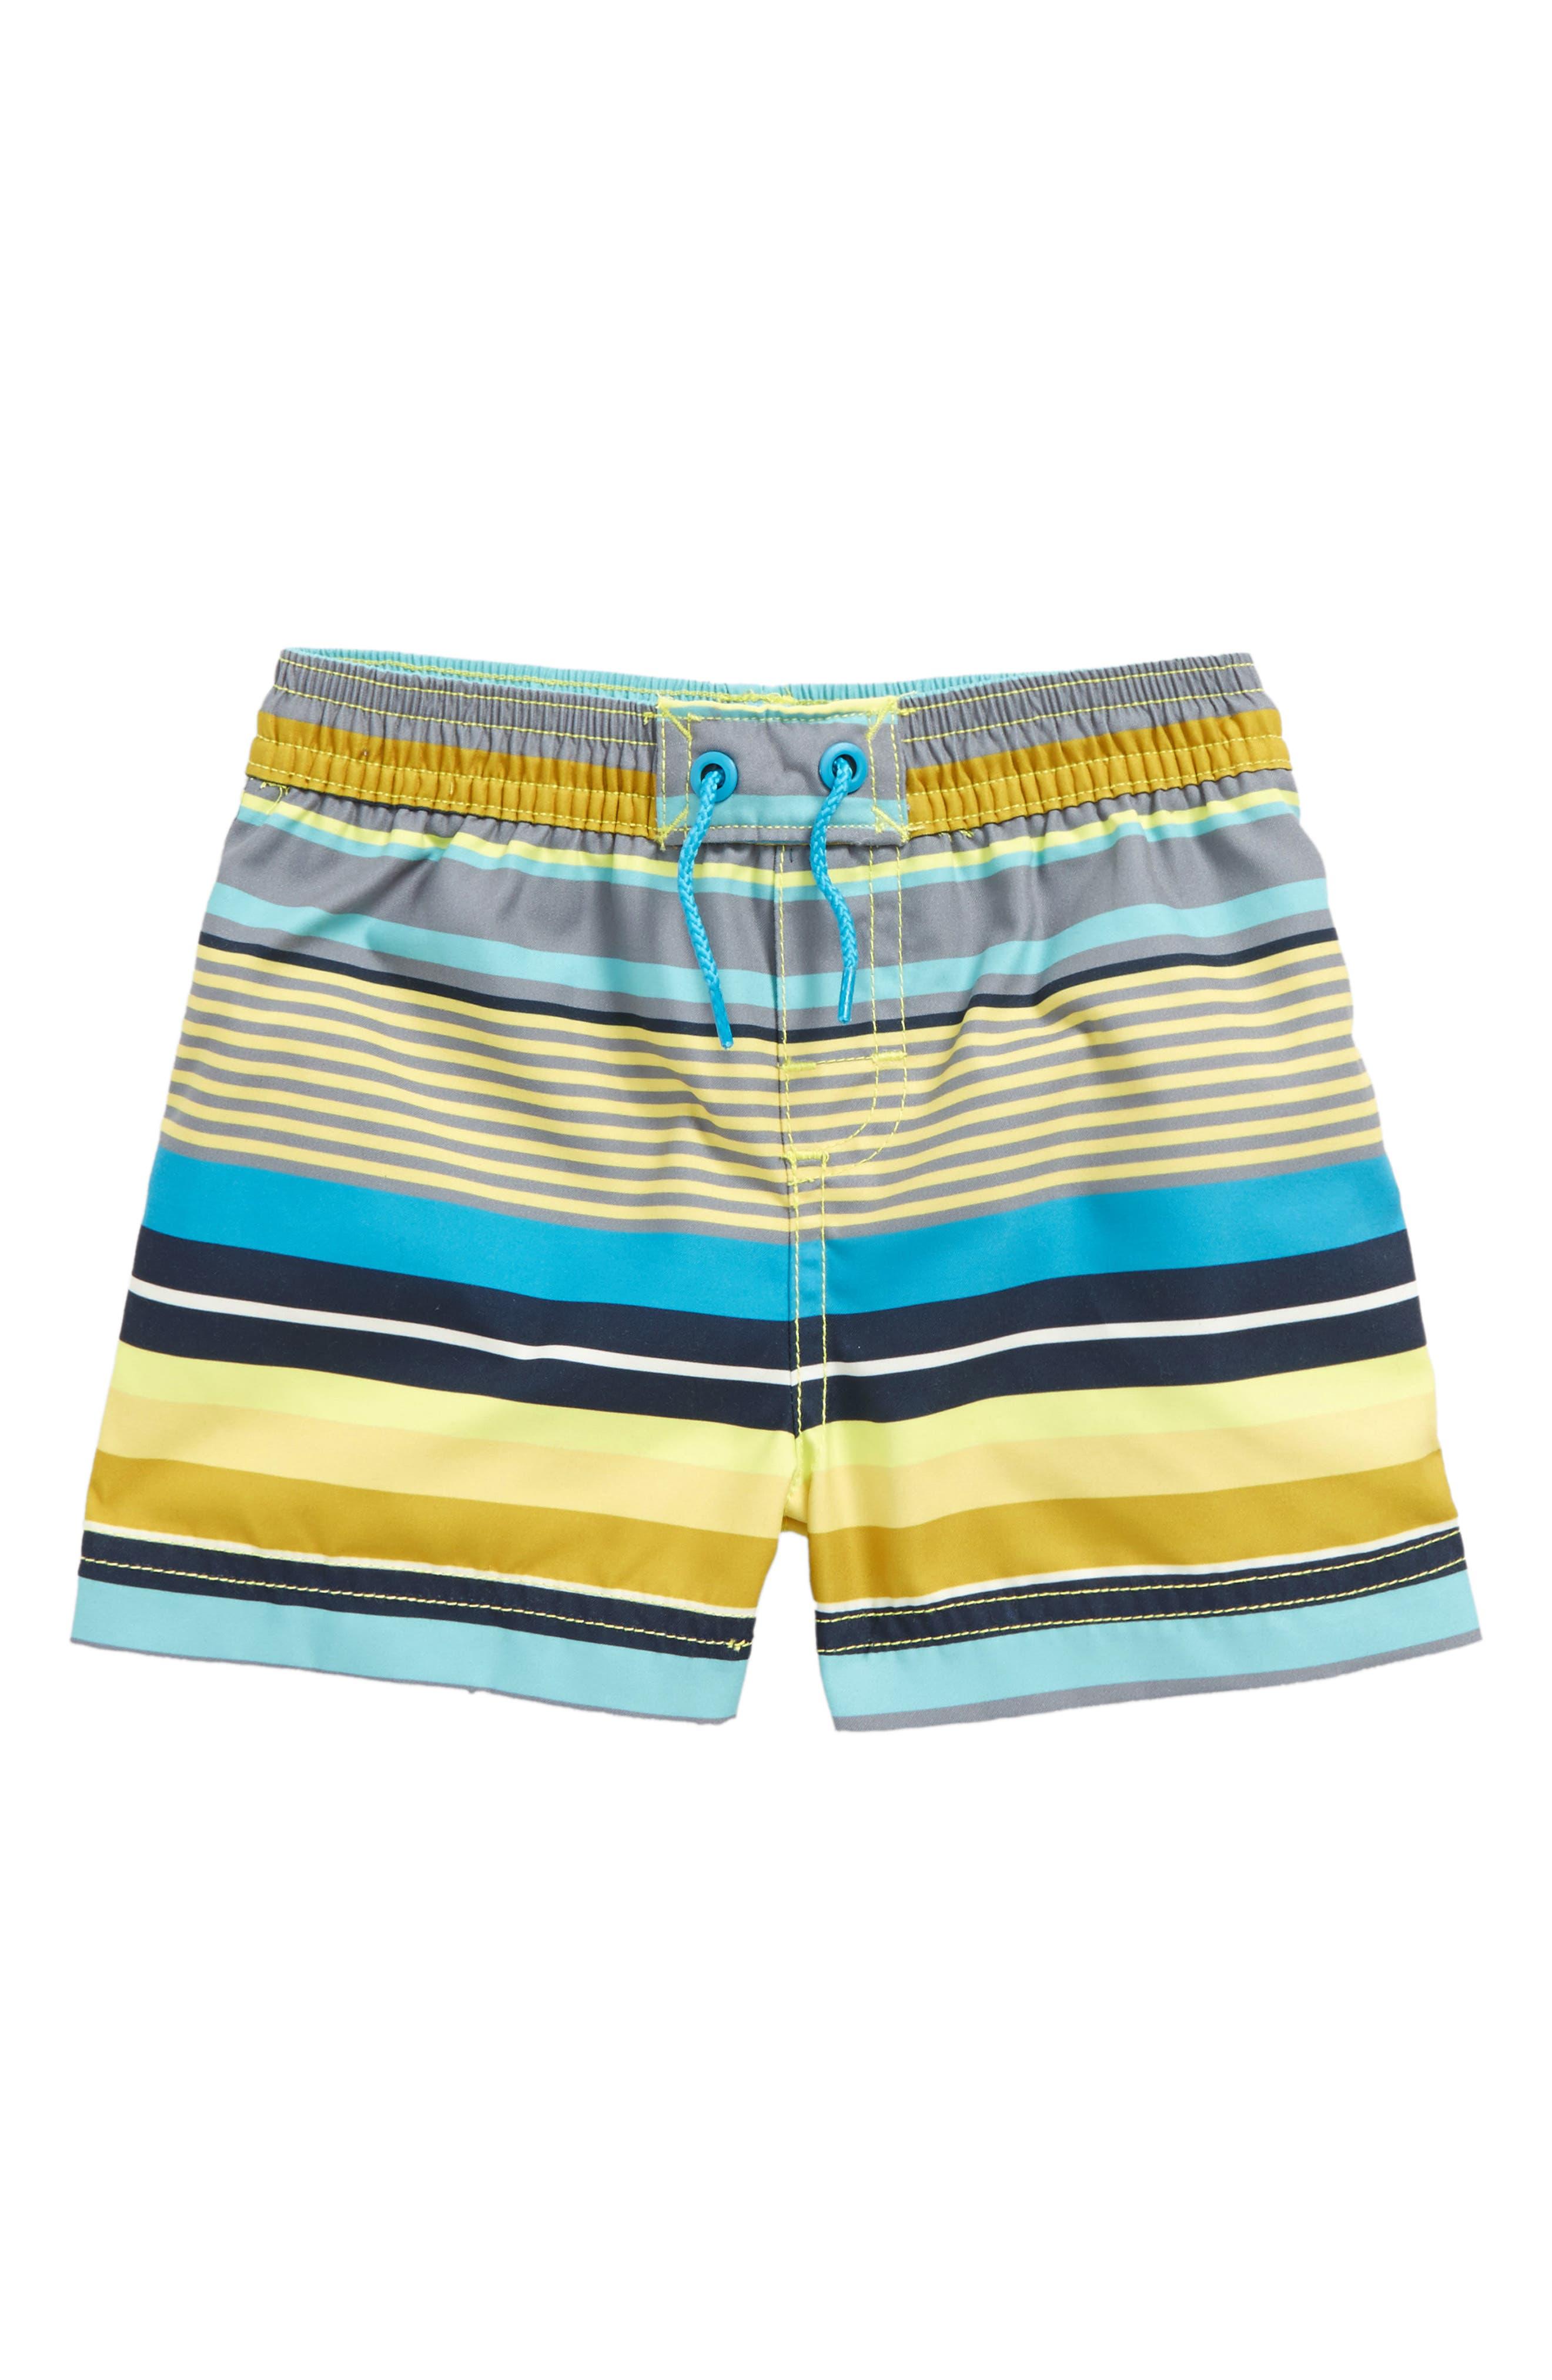 Tea Collection Dawn Patrol Swim Trunks (Baby Boys)